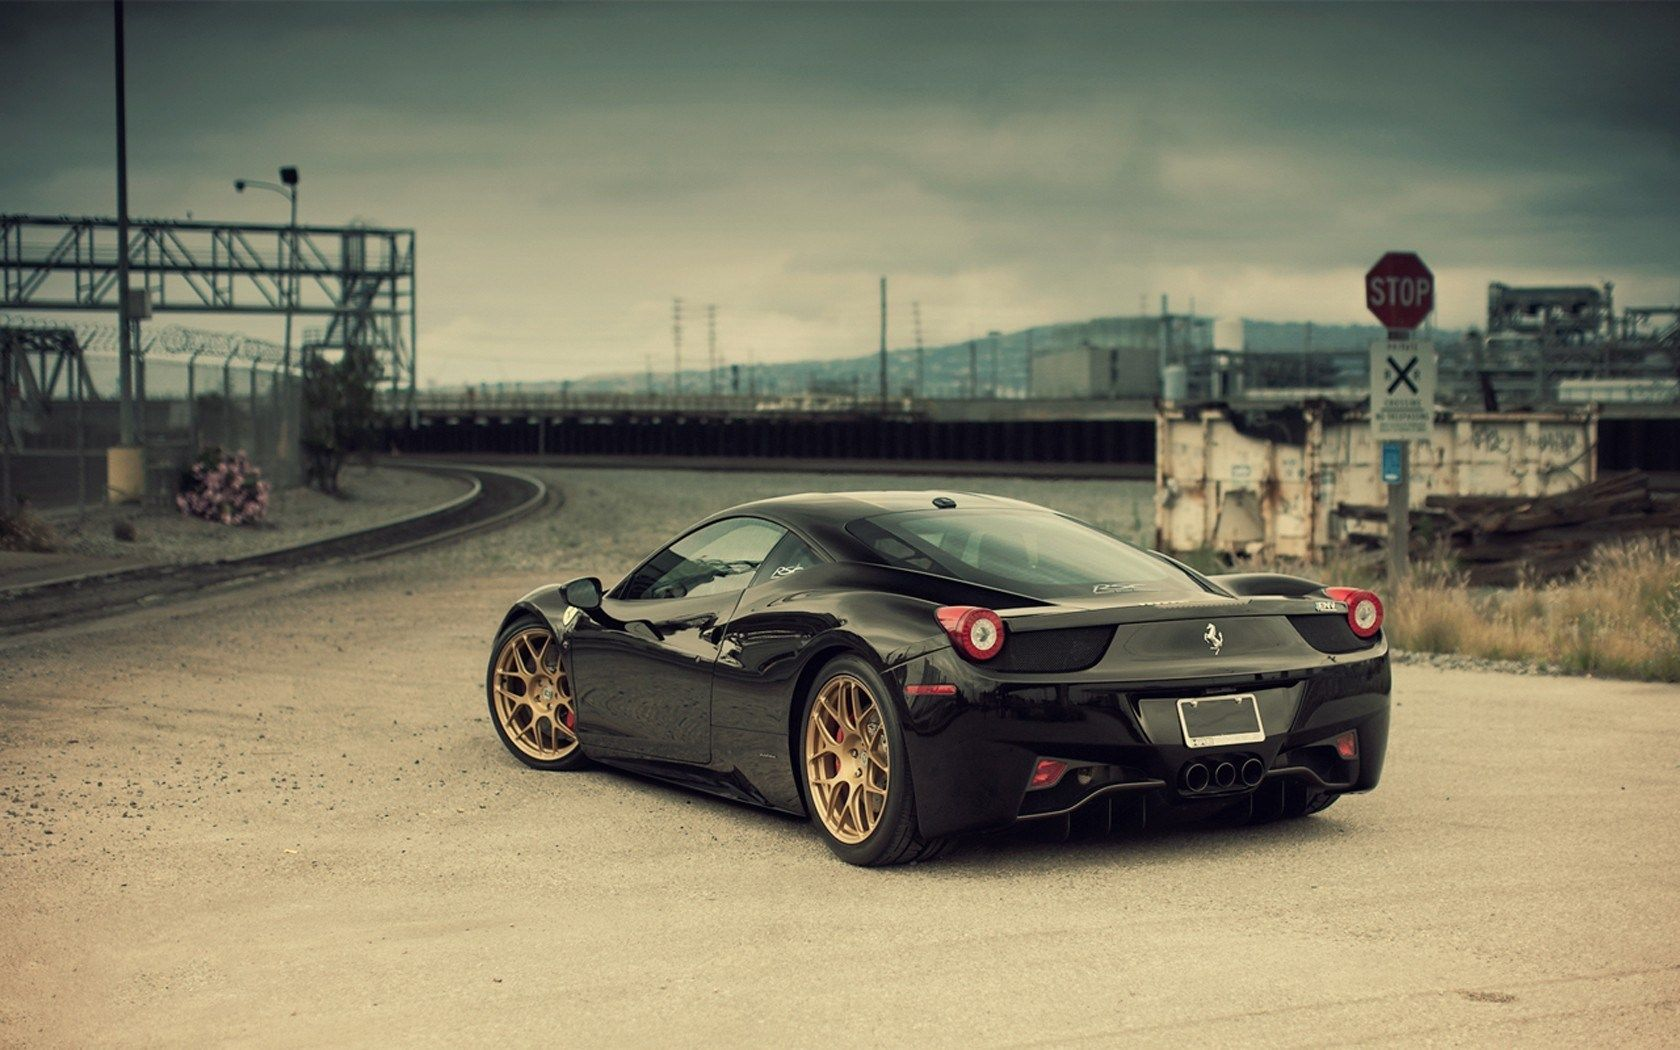 Black Ferrari Wallpapers Top Free Black Ferrari